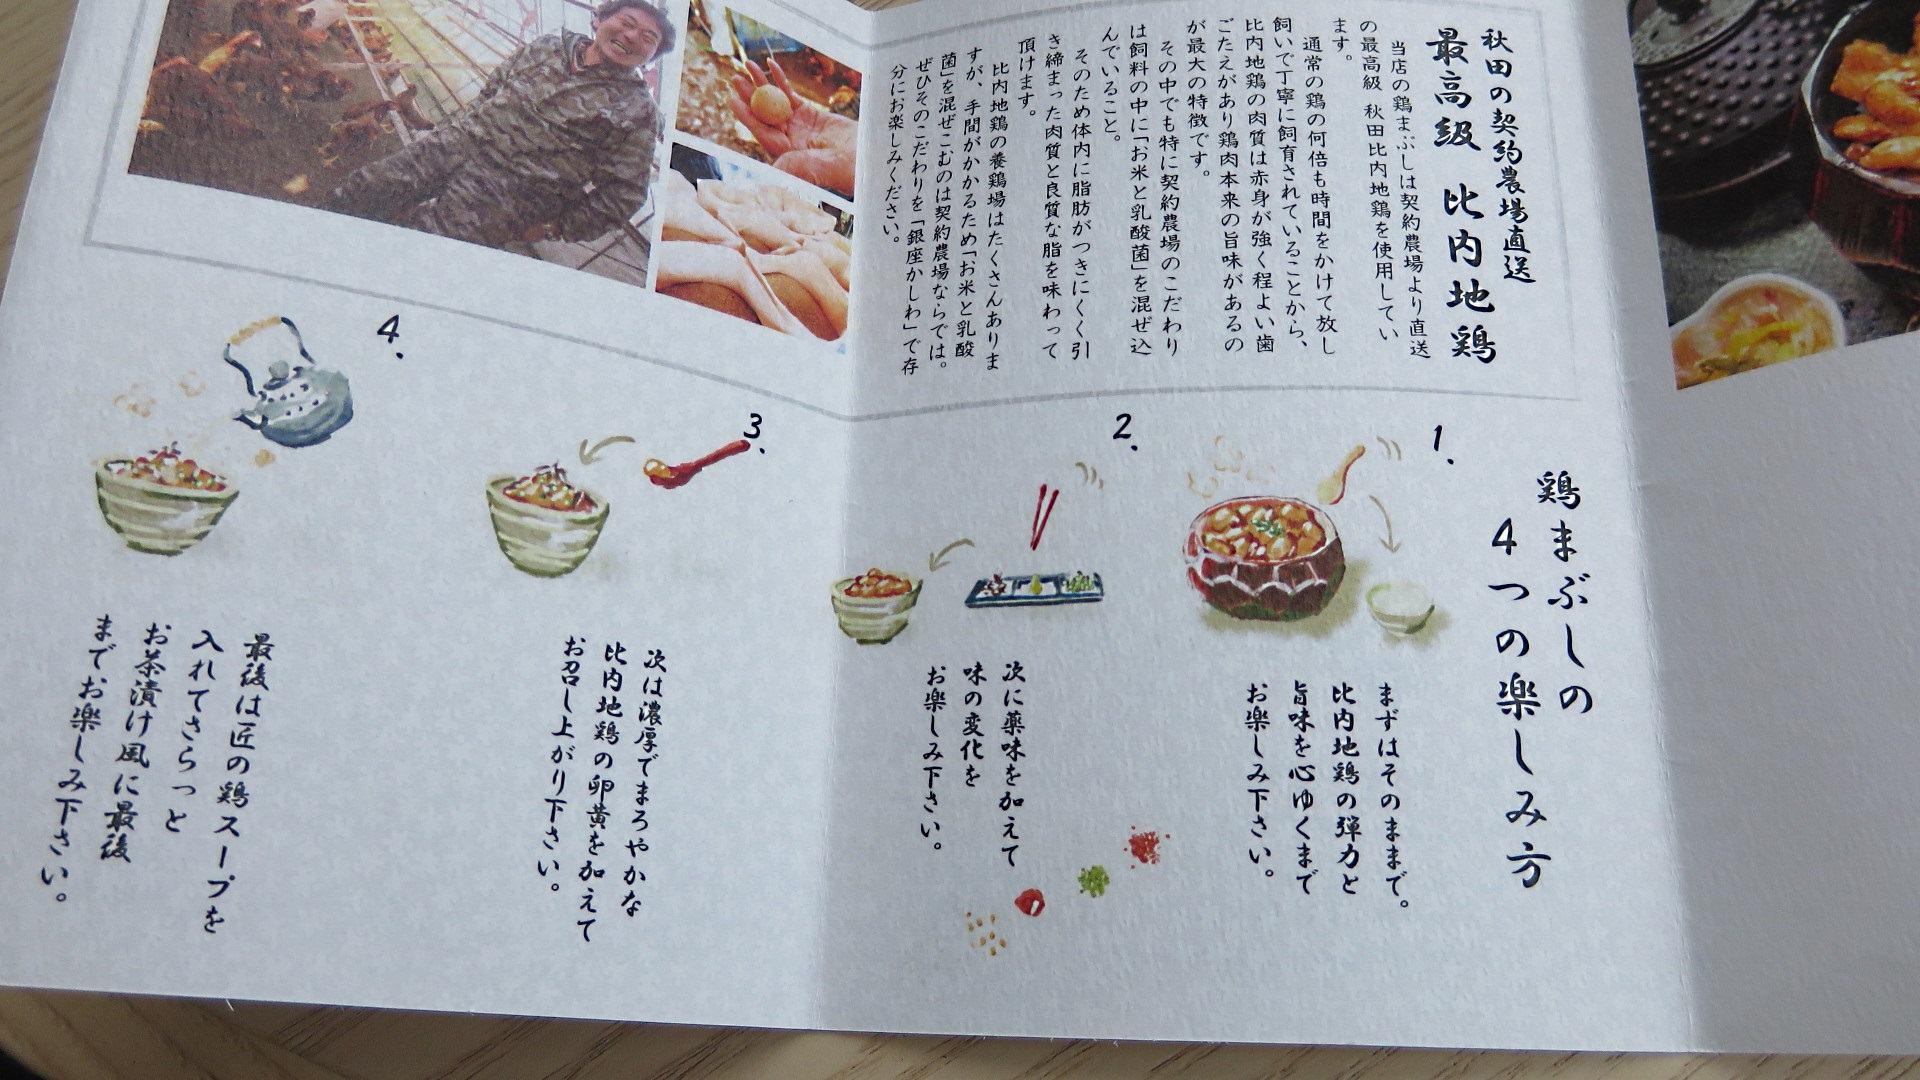 地雞MABUSHI的四種吃法